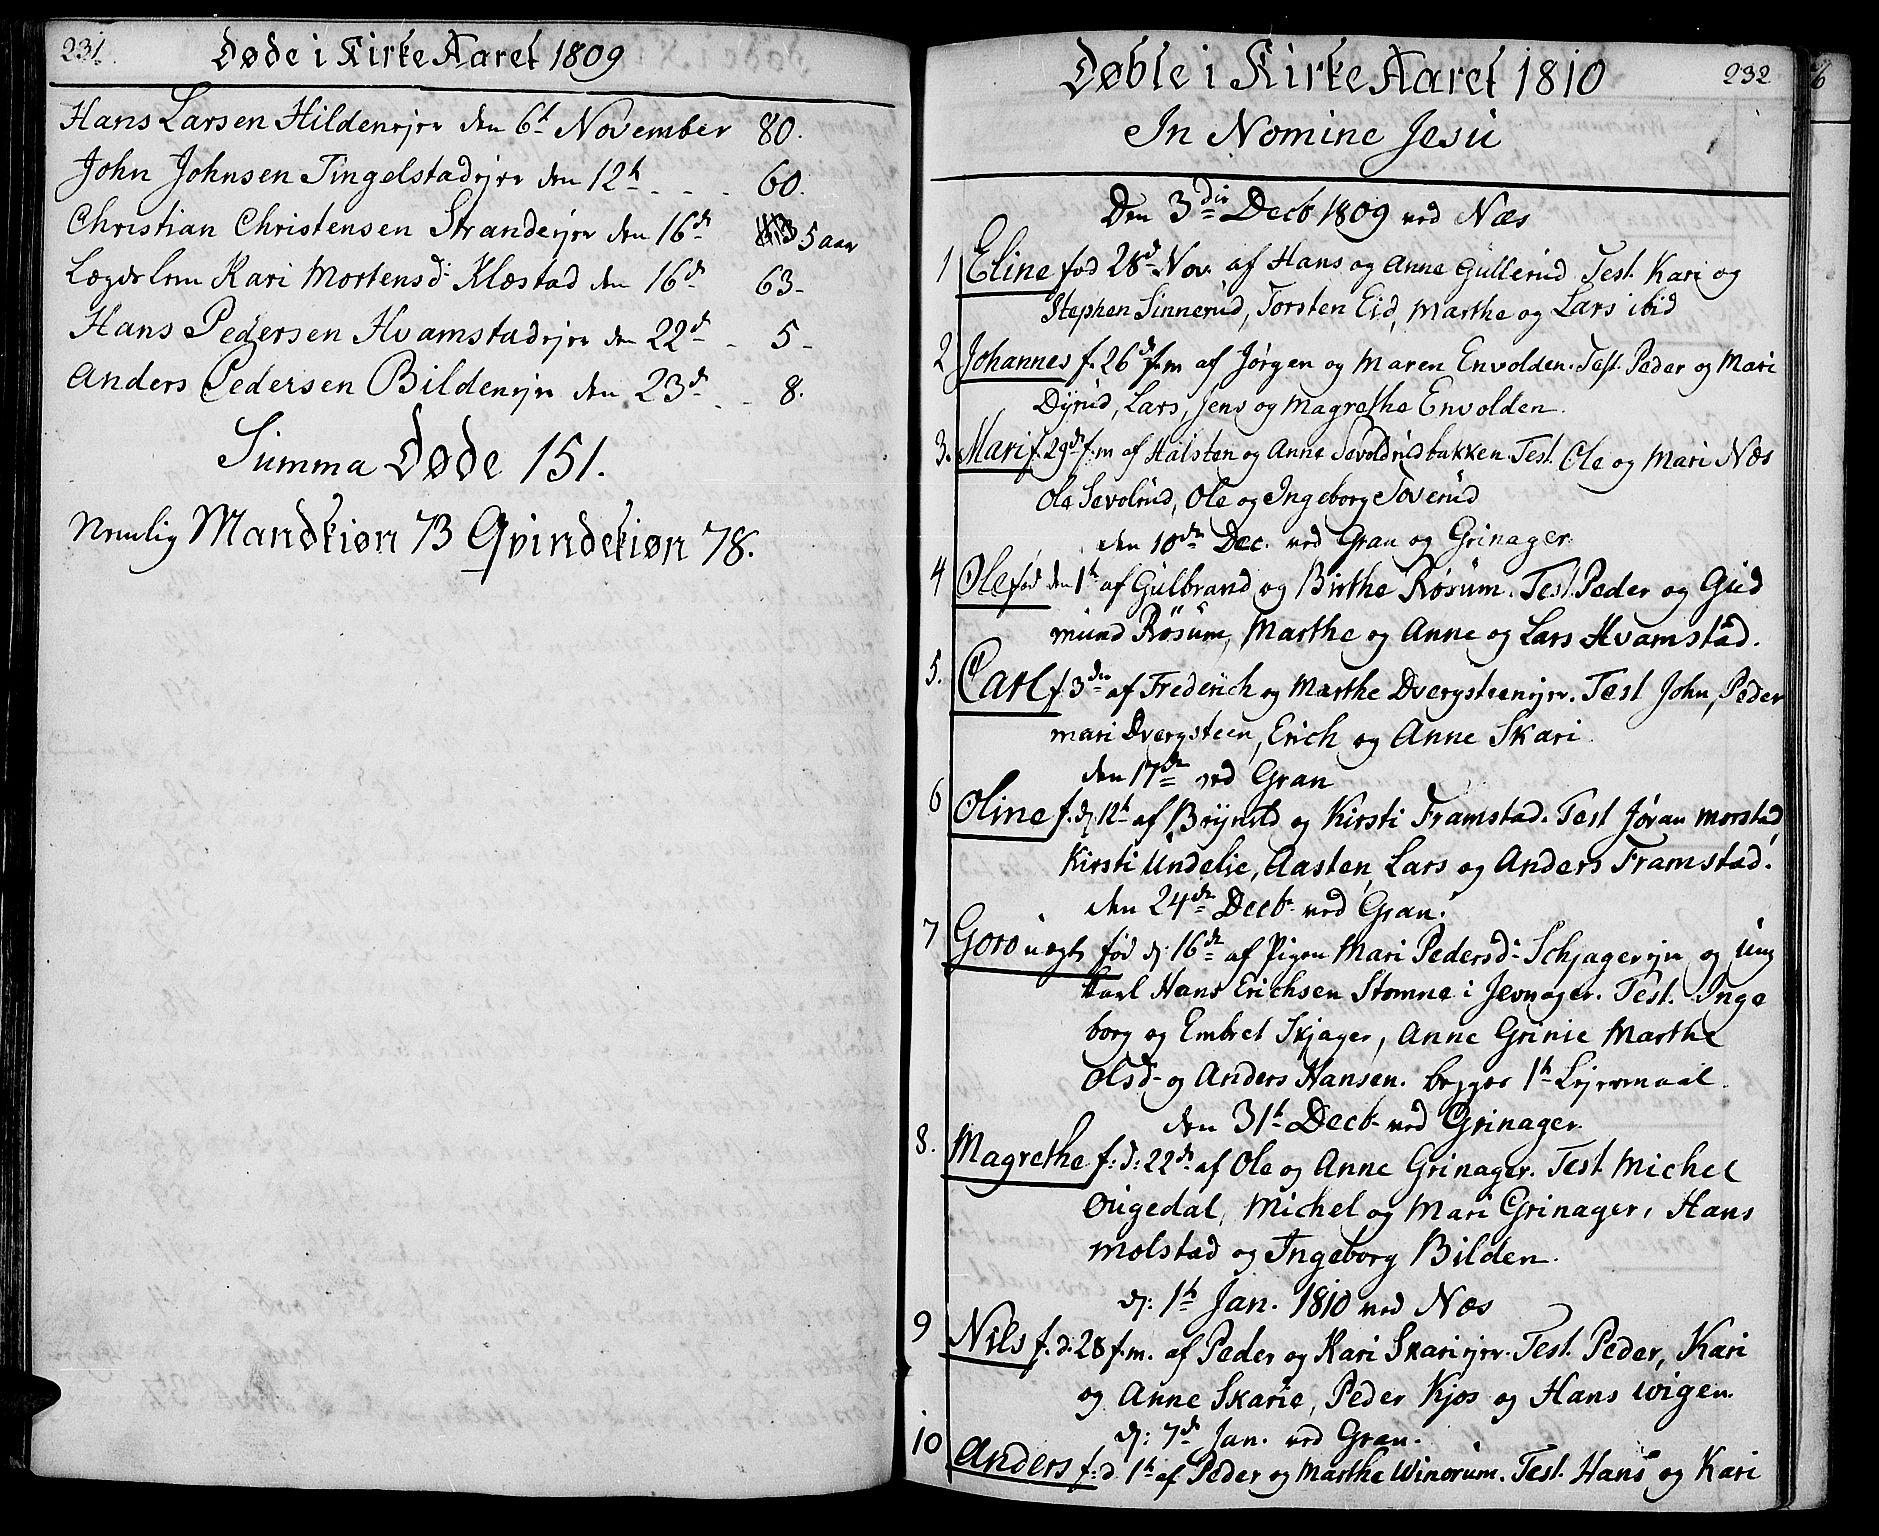 SAH, Gran prestekontor, Ministerialbok nr. 8, 1798-1811, s. 231-232